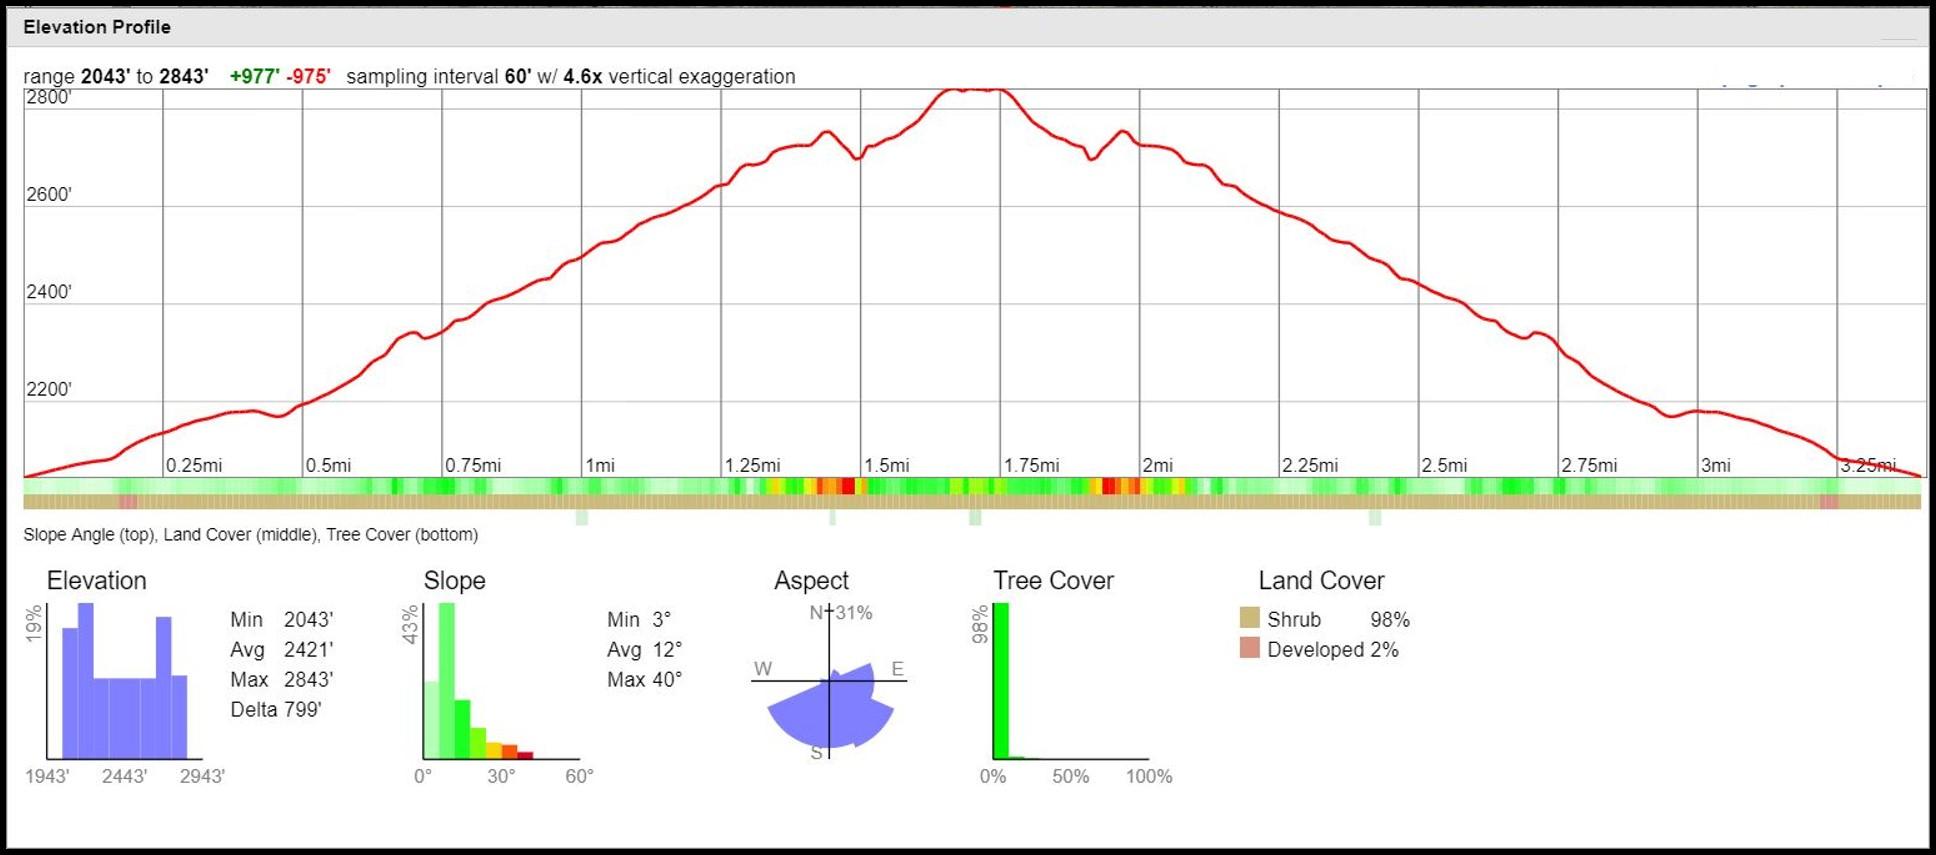 Etiwanda Falls Elevation Profile